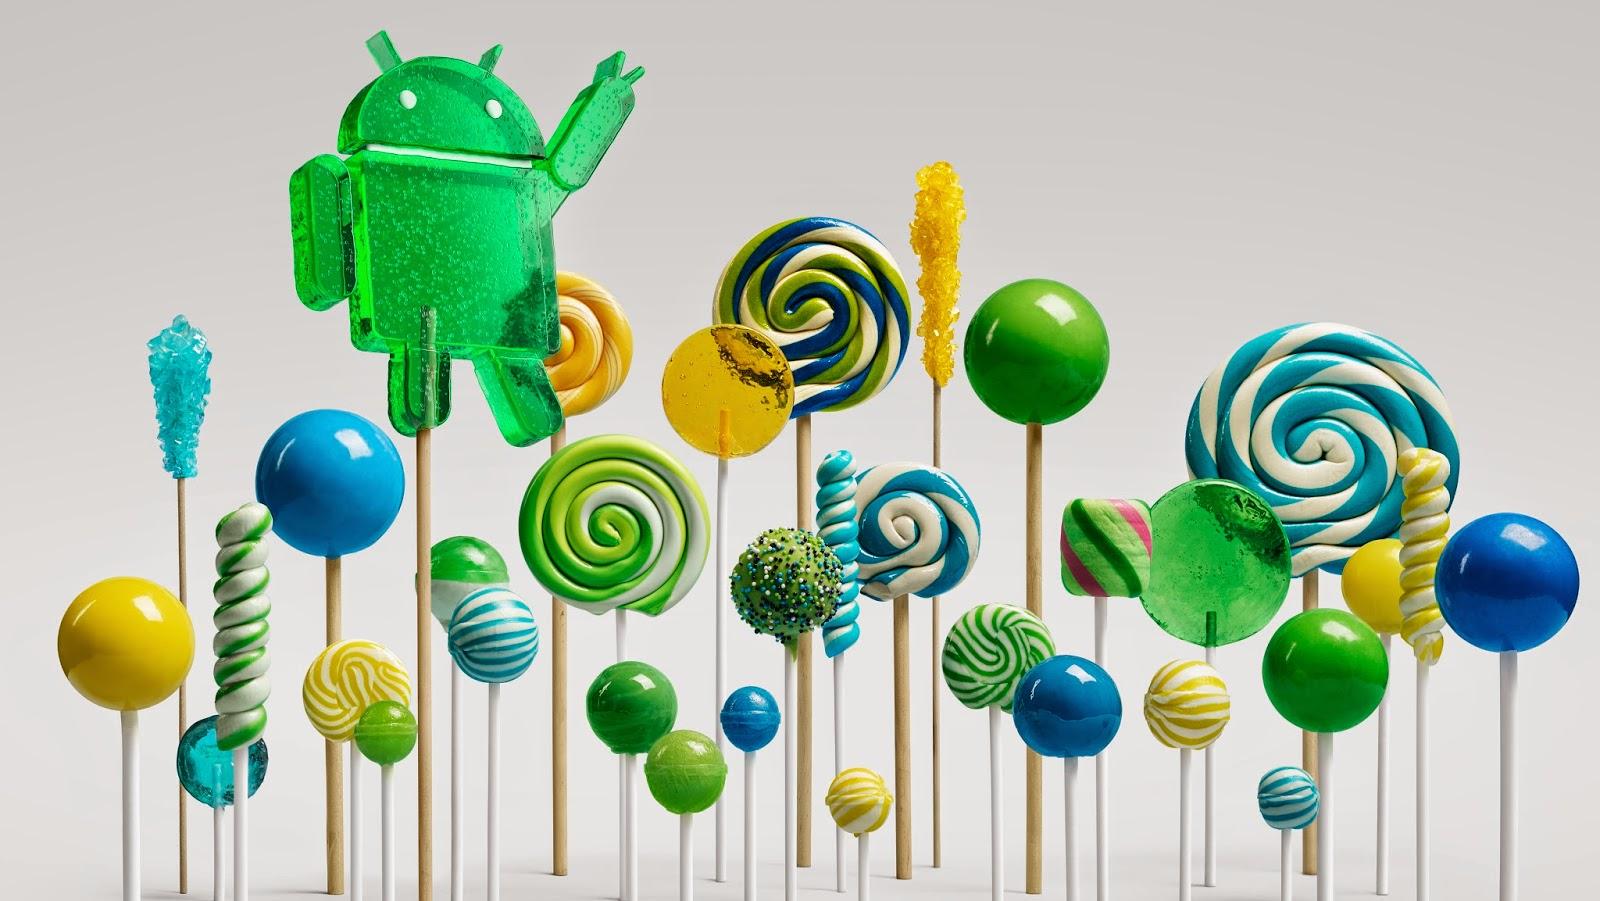 Android 5.0 Lollipop aktualizacja